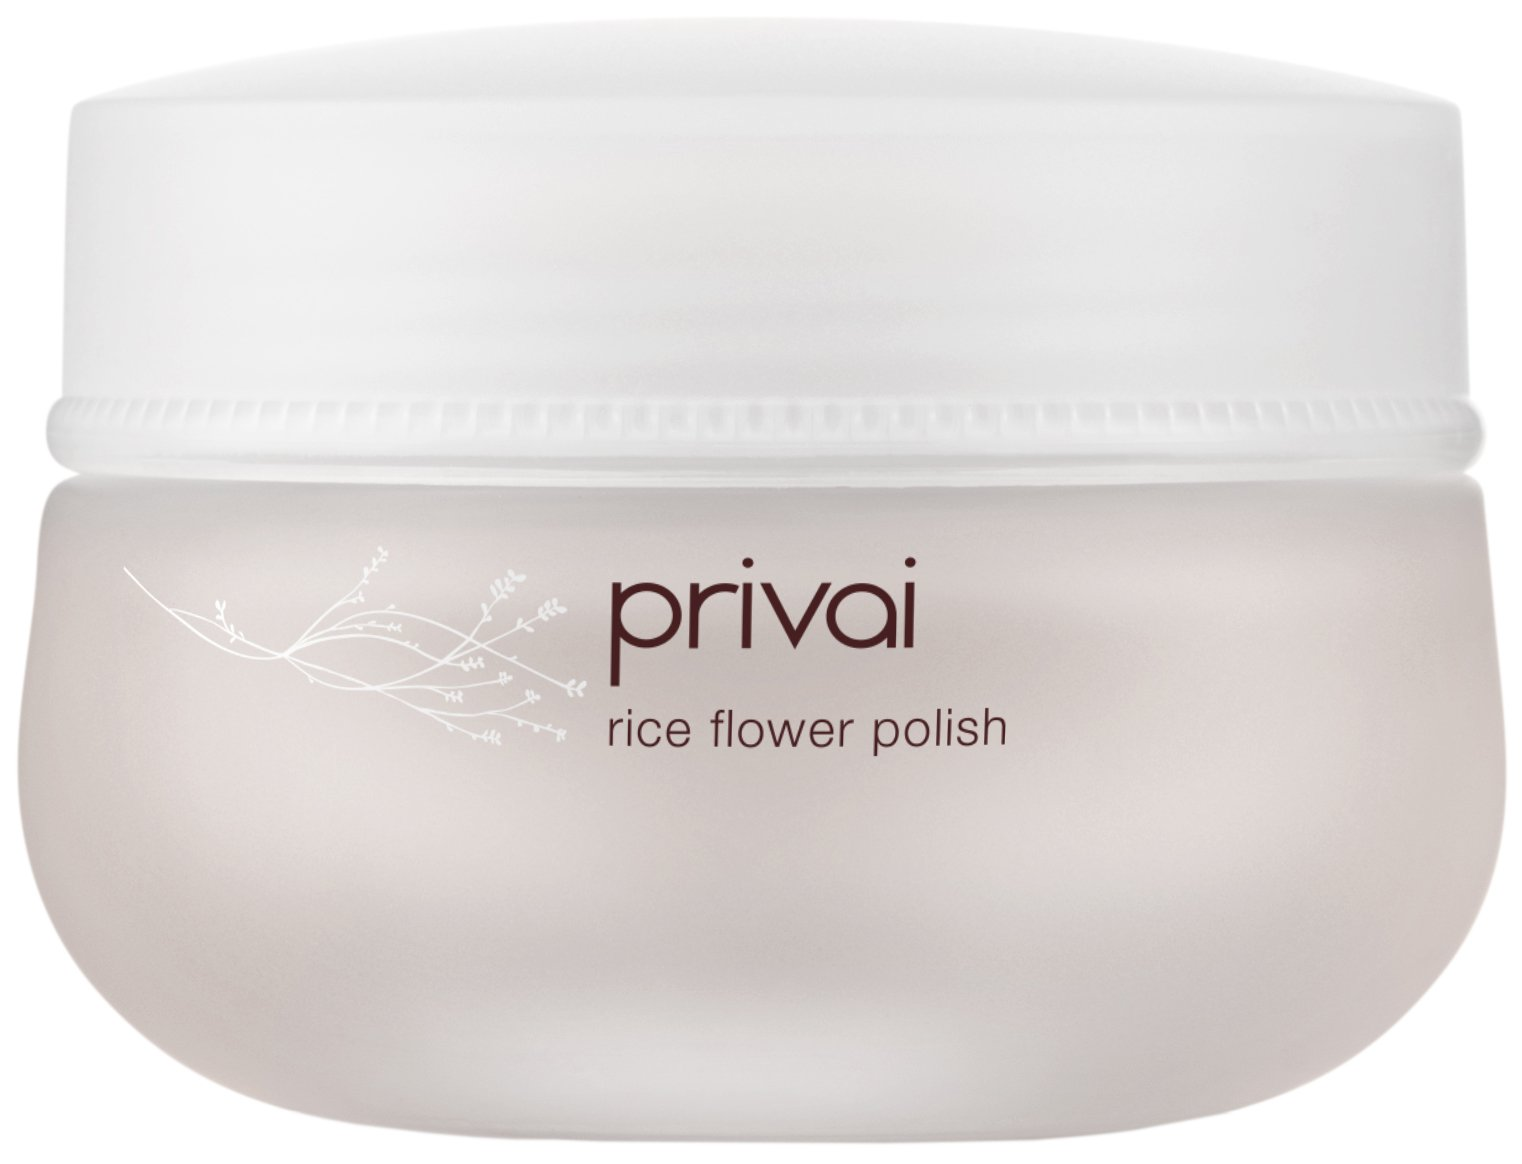 Privai Rice Flower Polish - Natural, Paraben-Free, Brightening Facial Exfoliator (1.7 Ounces, 50 Grams)